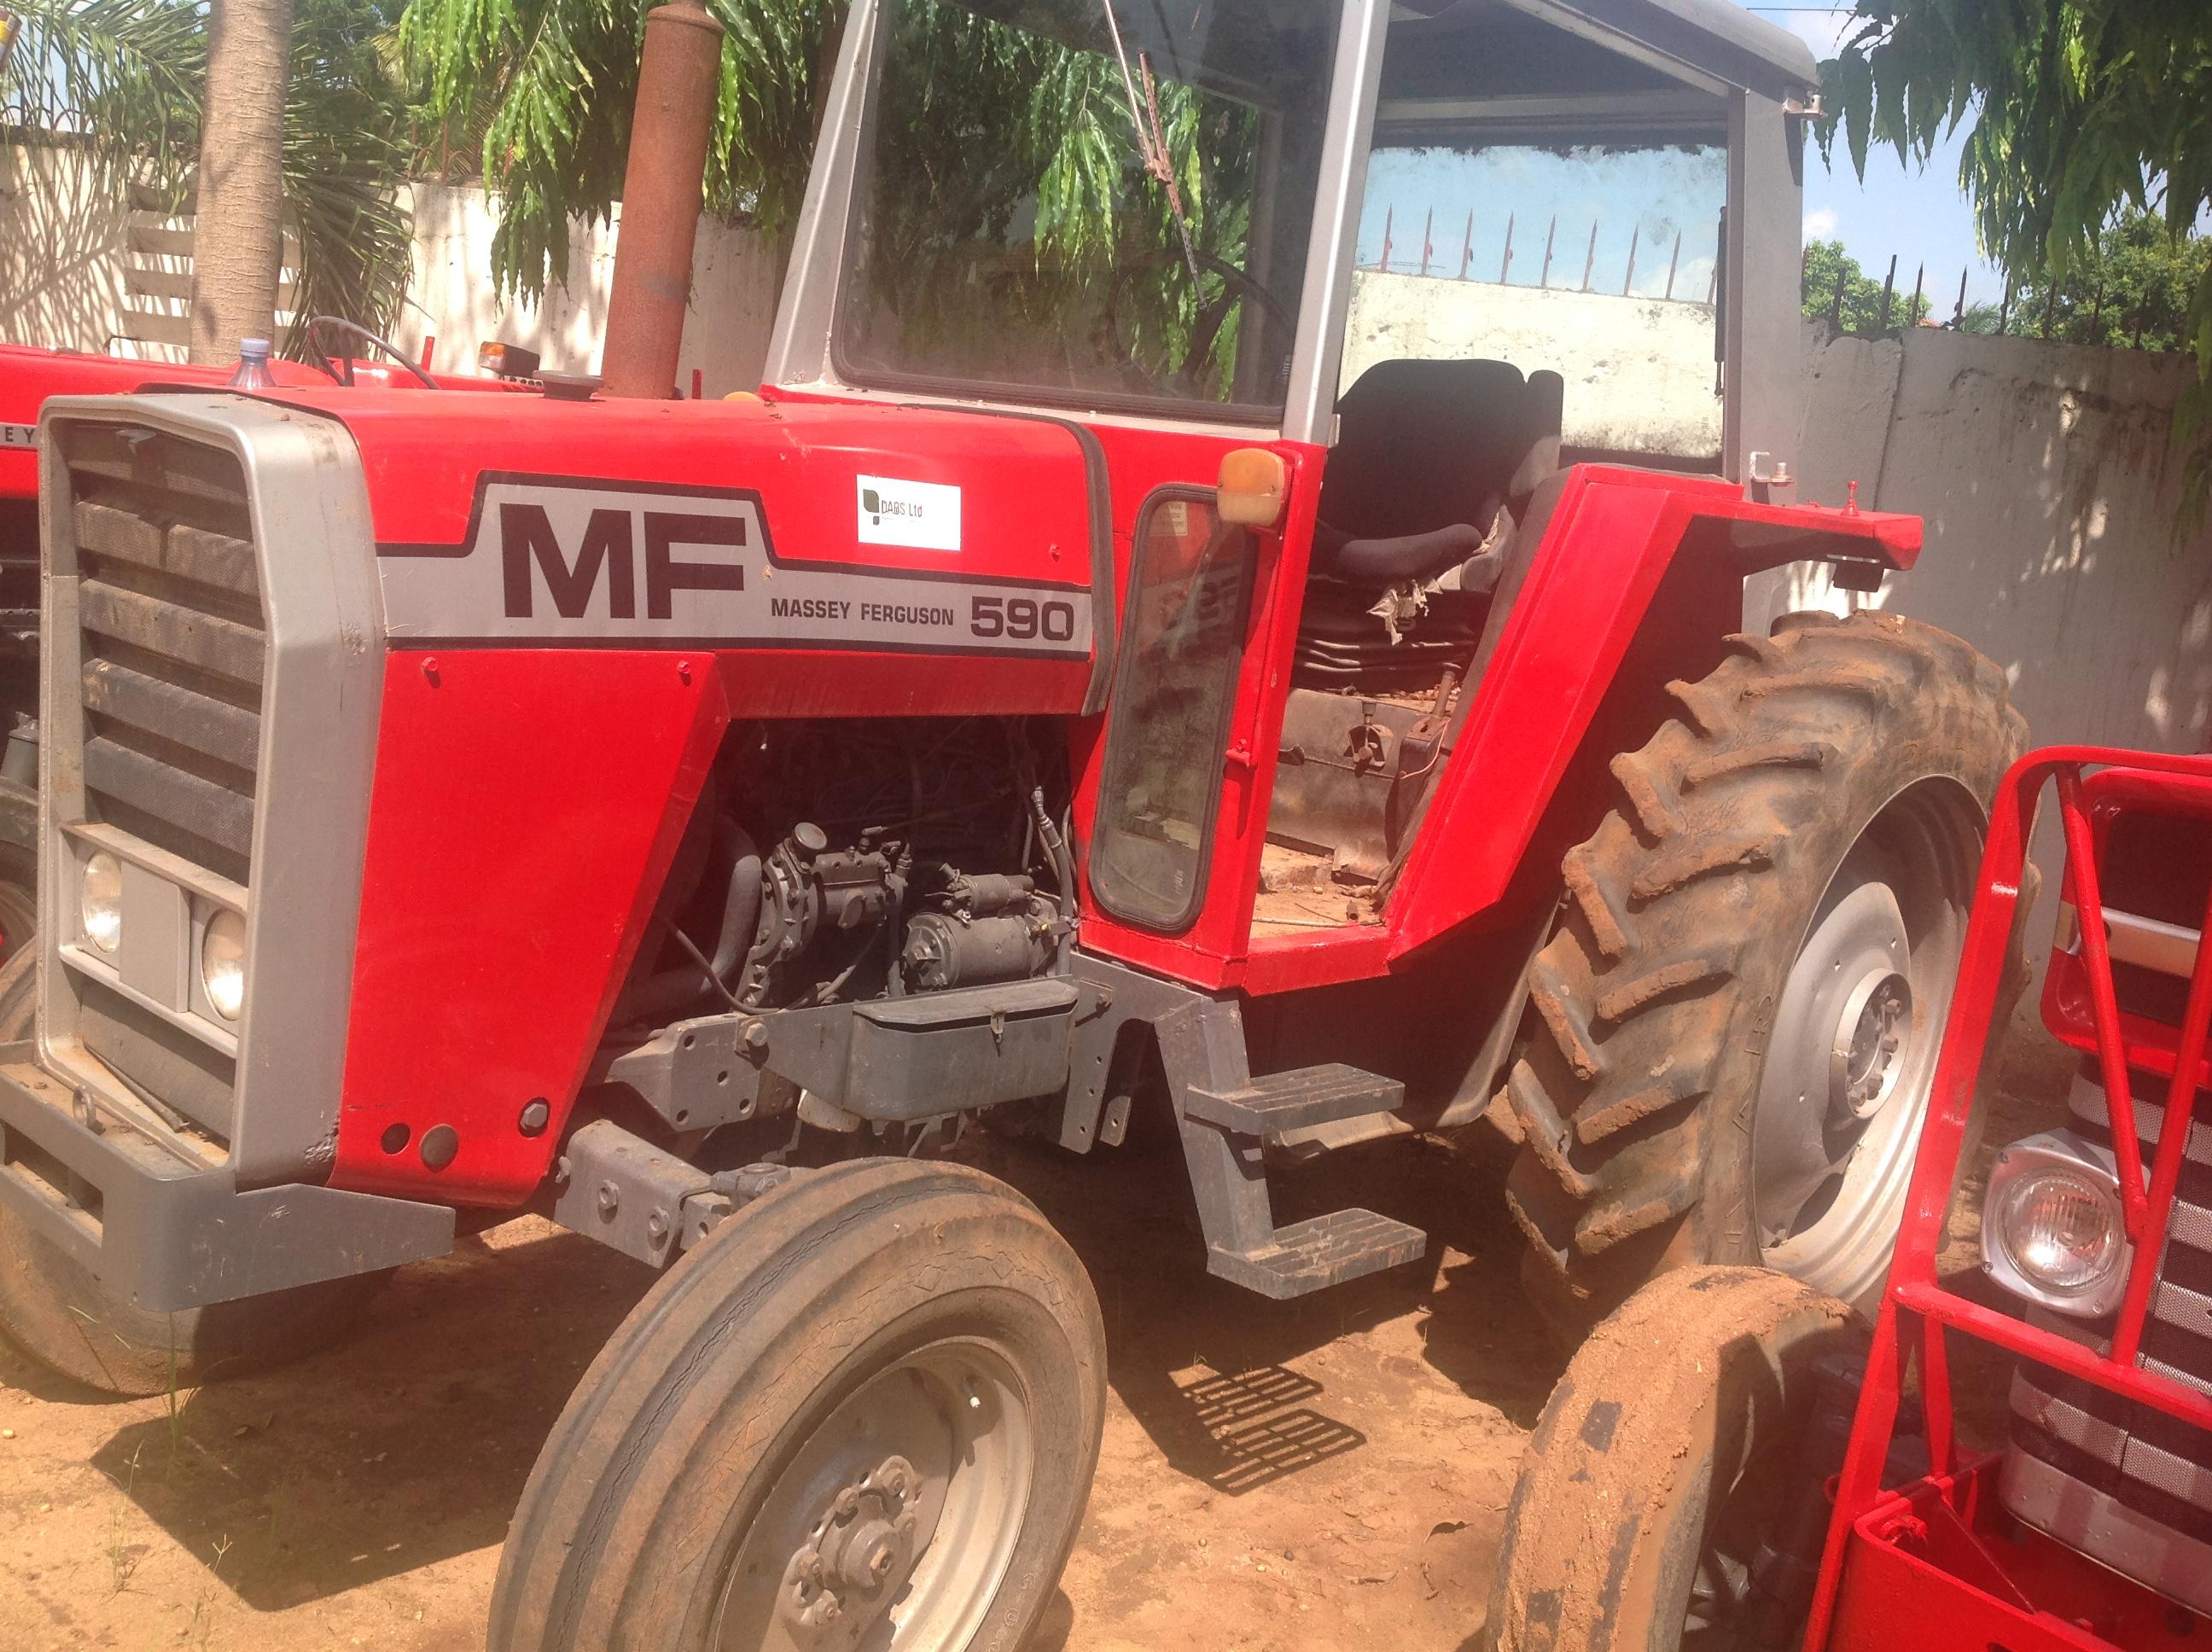 used massey ferguson 590 used tractors tanzania rh danagrisol com massey ferguson 590 manual download massey ferguson 590 parts manual